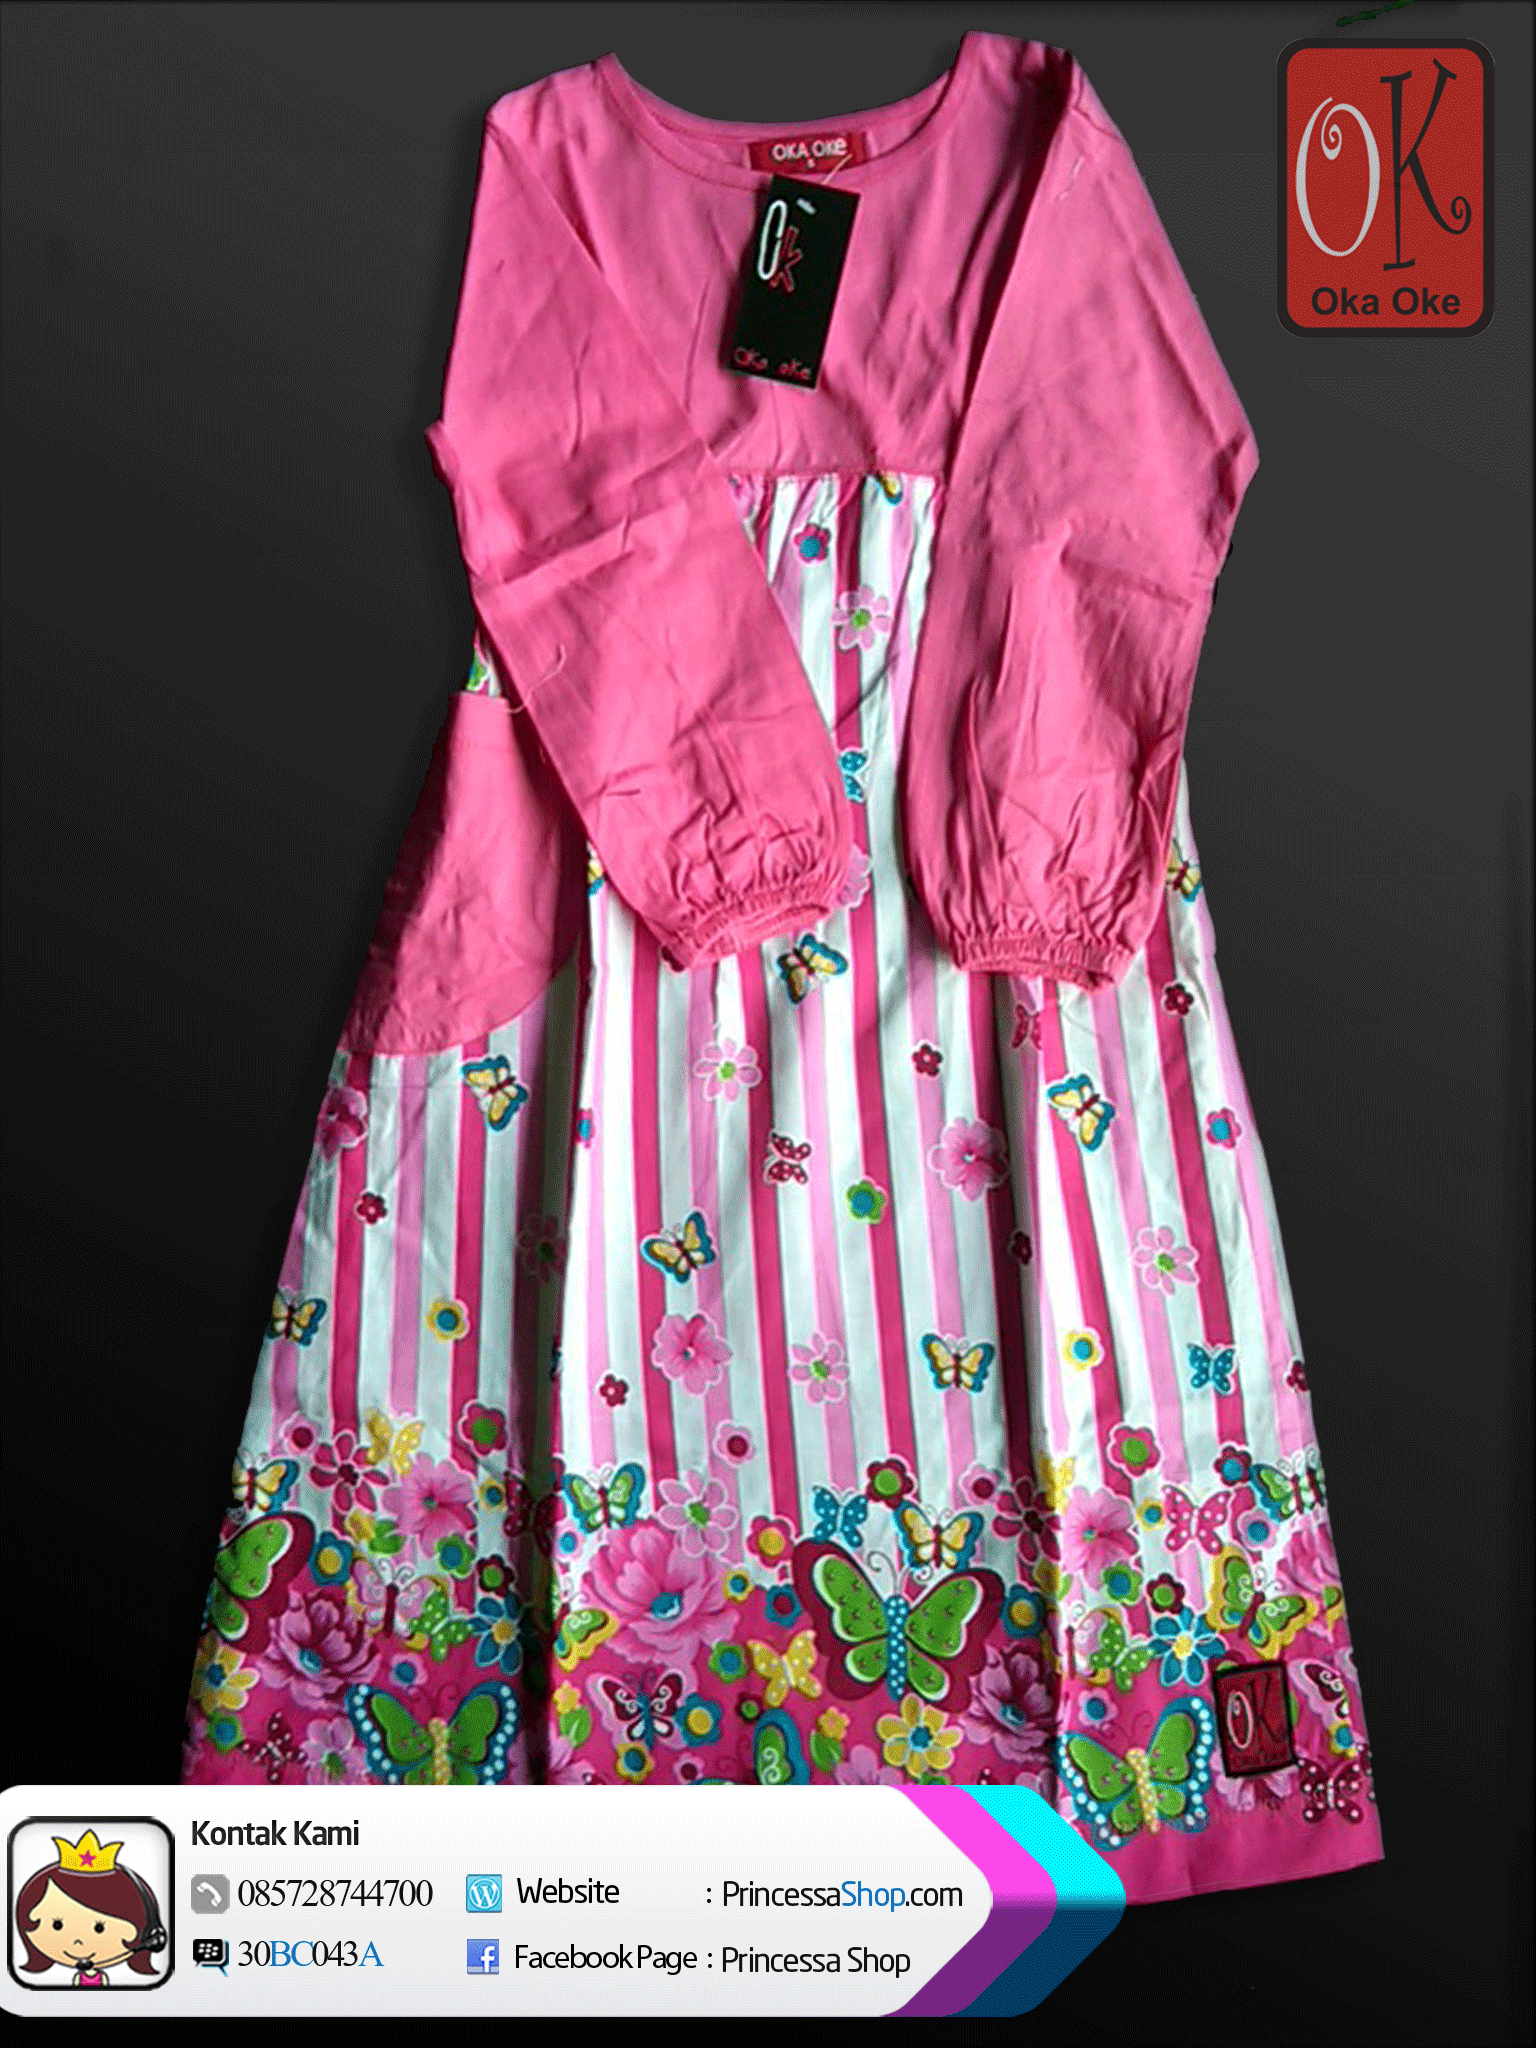 Pusat Grosir Baju Gamis Oka Oke Solo  Baju Gamis Anak  Model